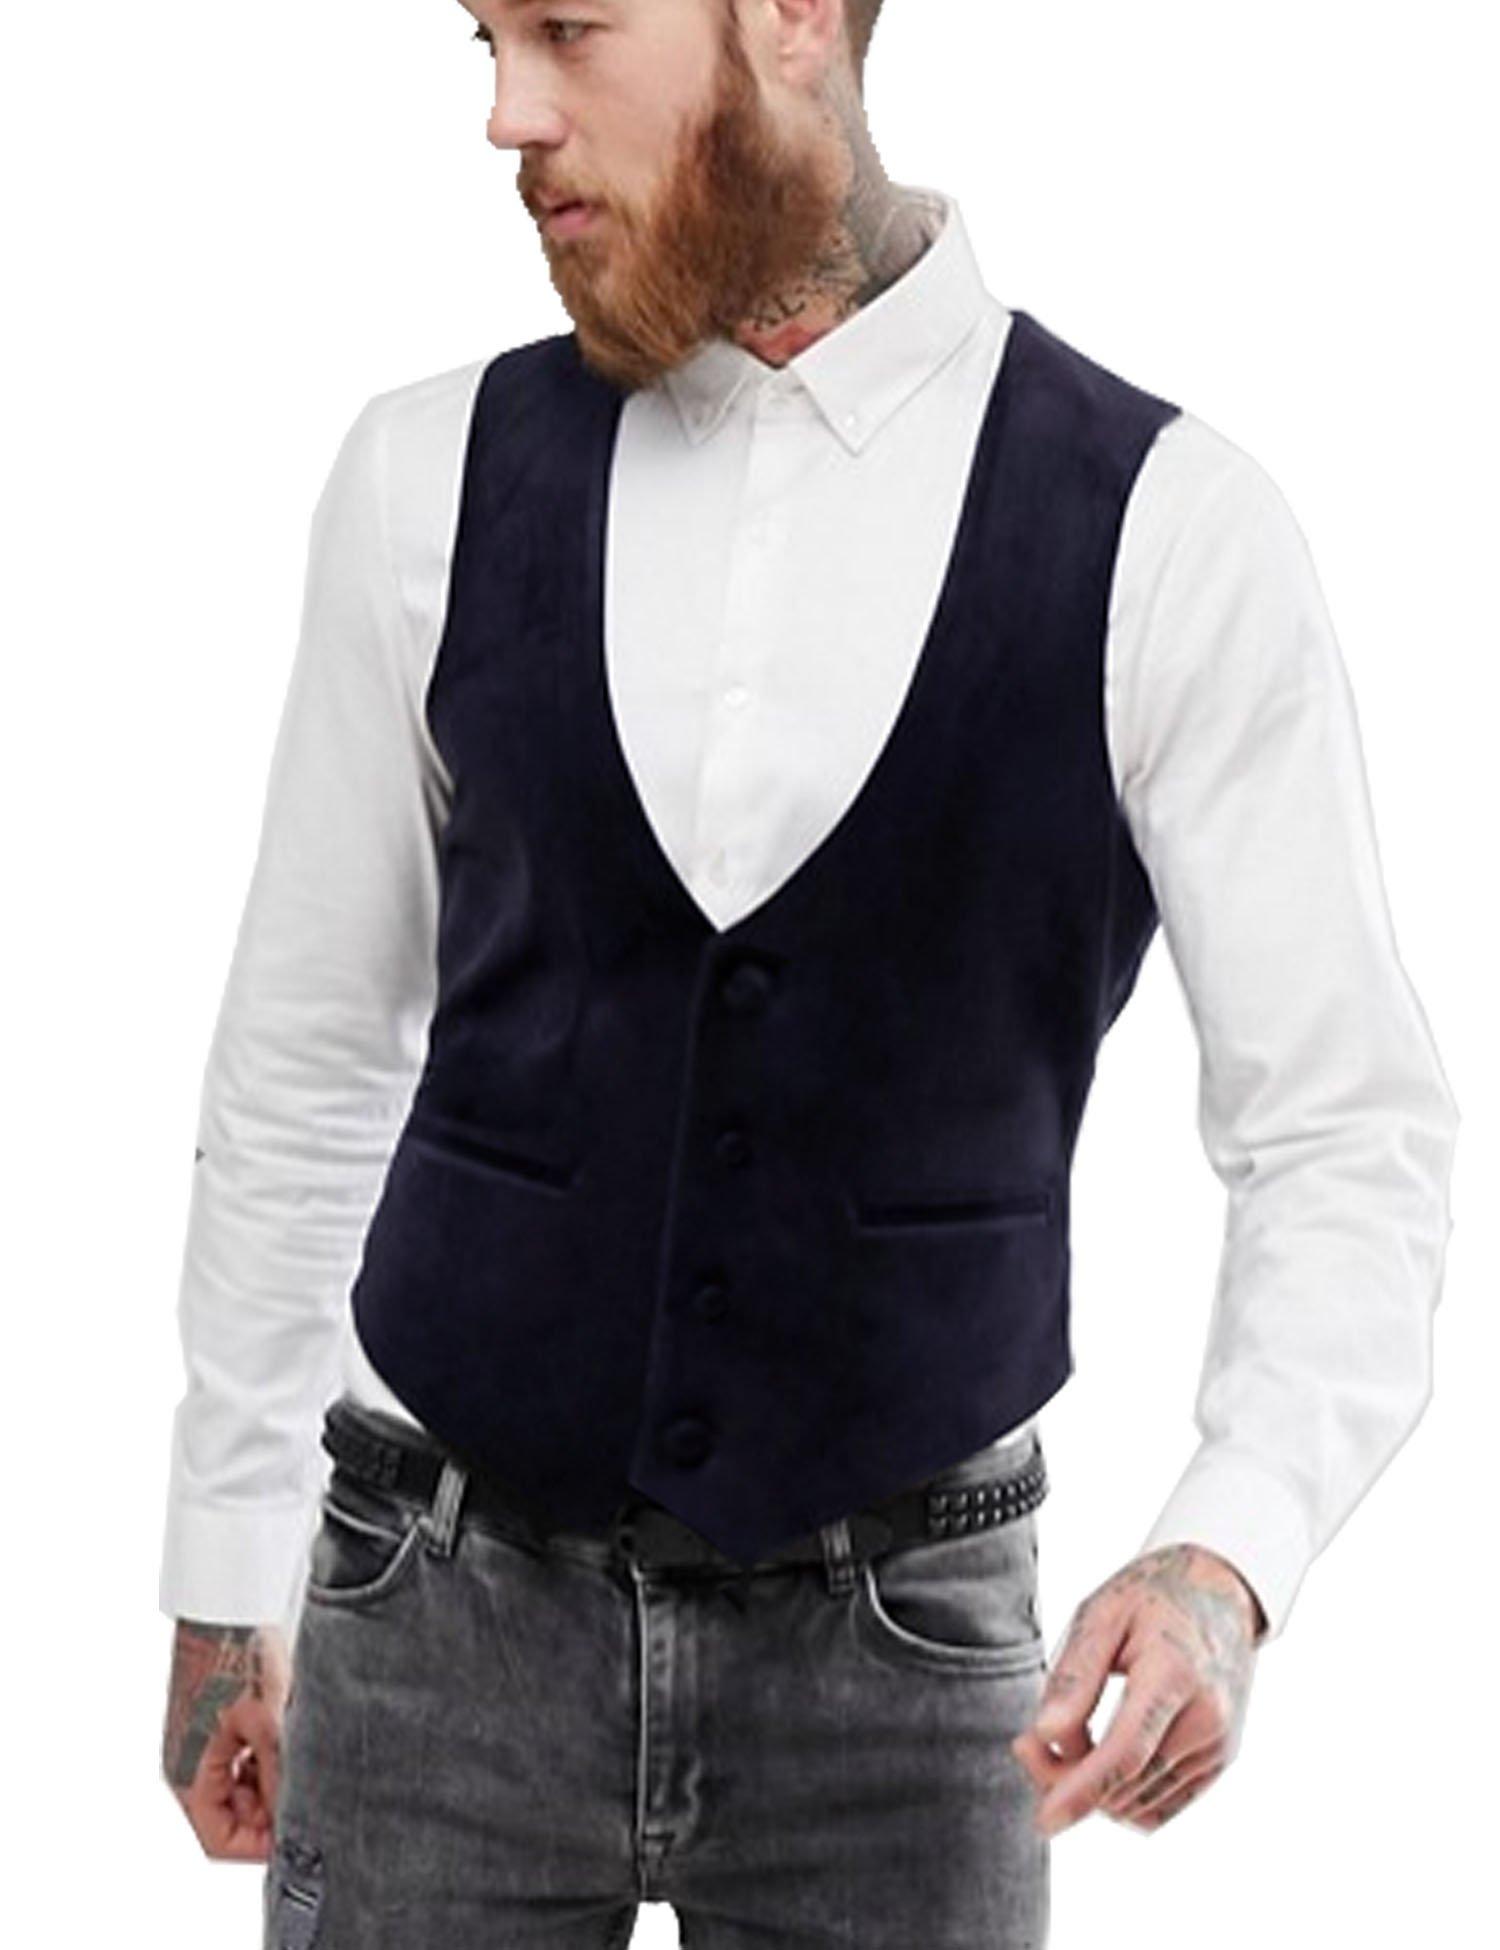 JINIDU Men's Formal Vest Slim Fit Skinny V-Neck Velvet Wedding Evening Suit Waistcoat